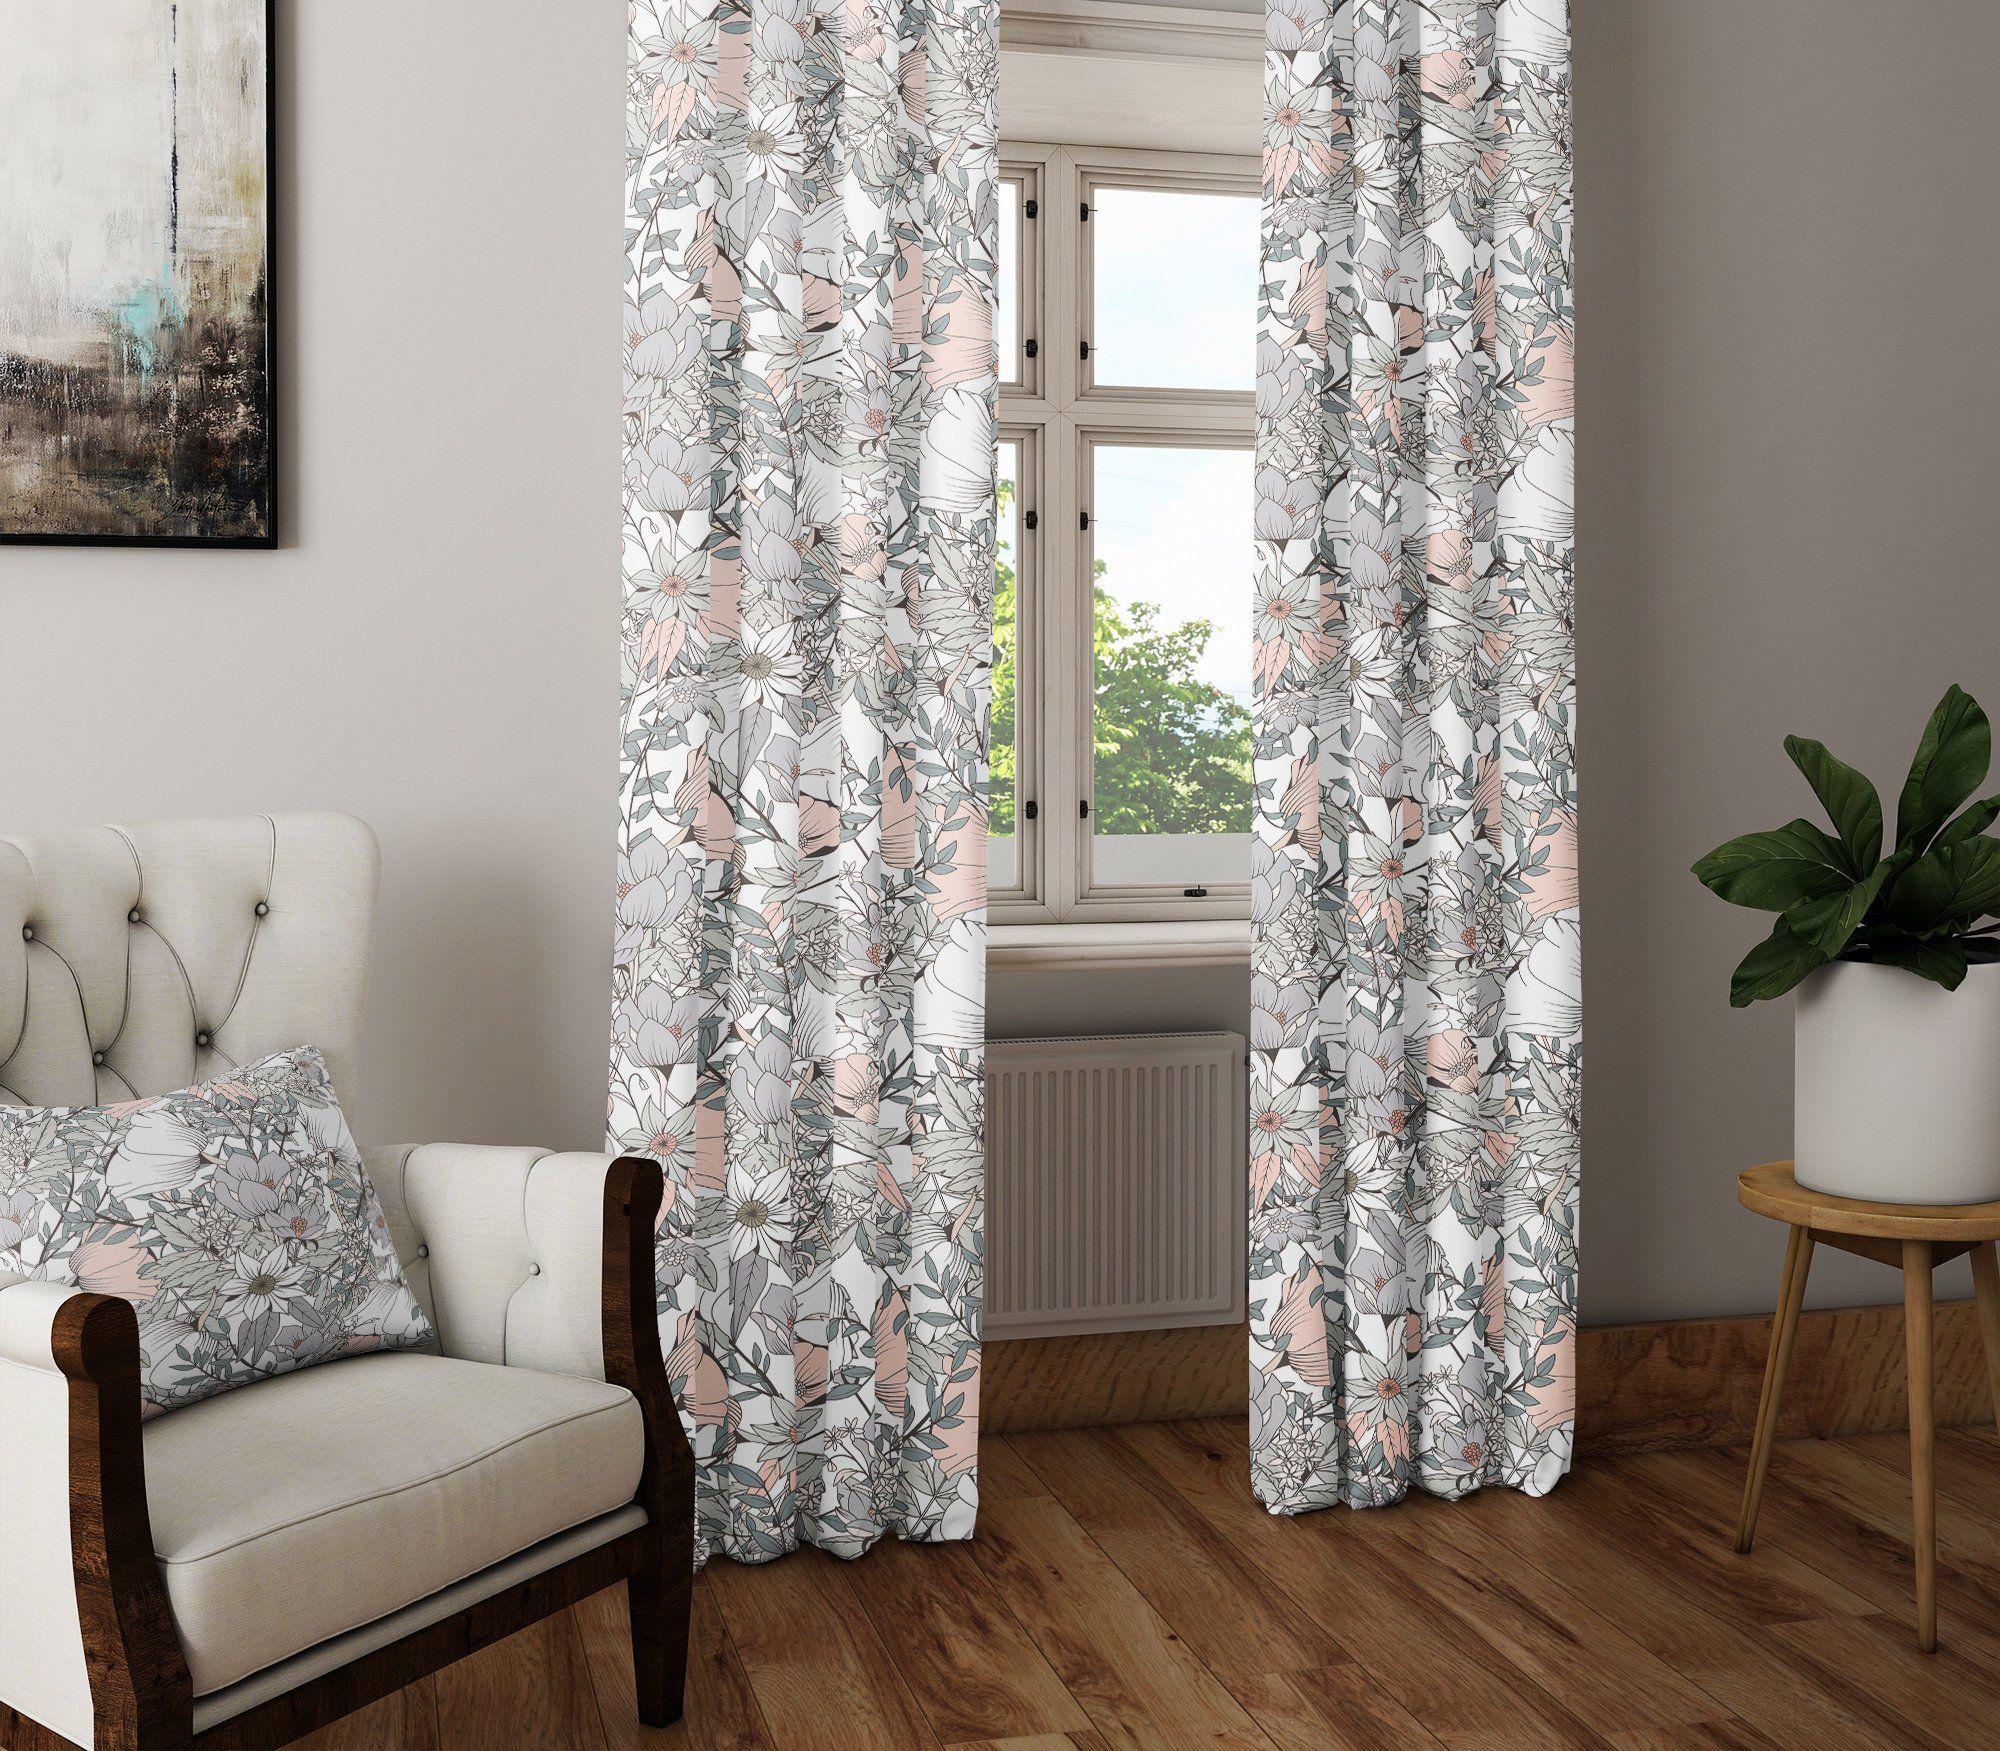 Napearl Modern Decorative Curtains Jacquard Gray Curtains Window